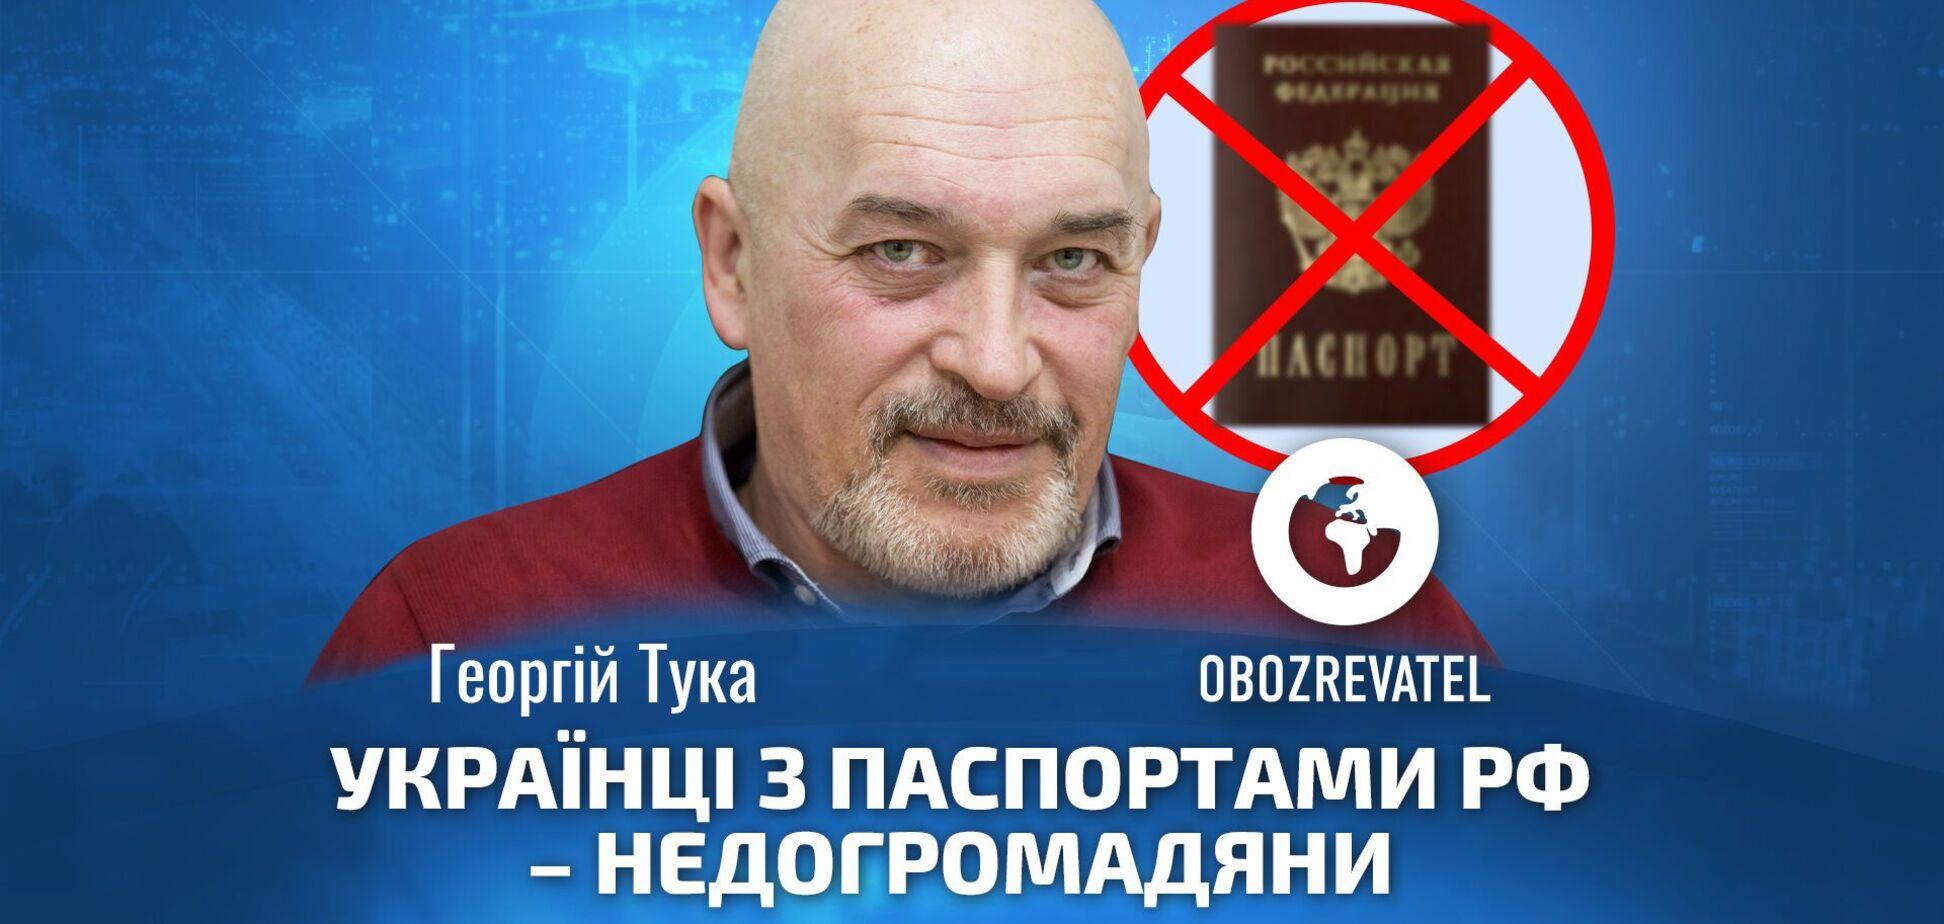 Тука: украинцы с паспортами РФ – недограждане